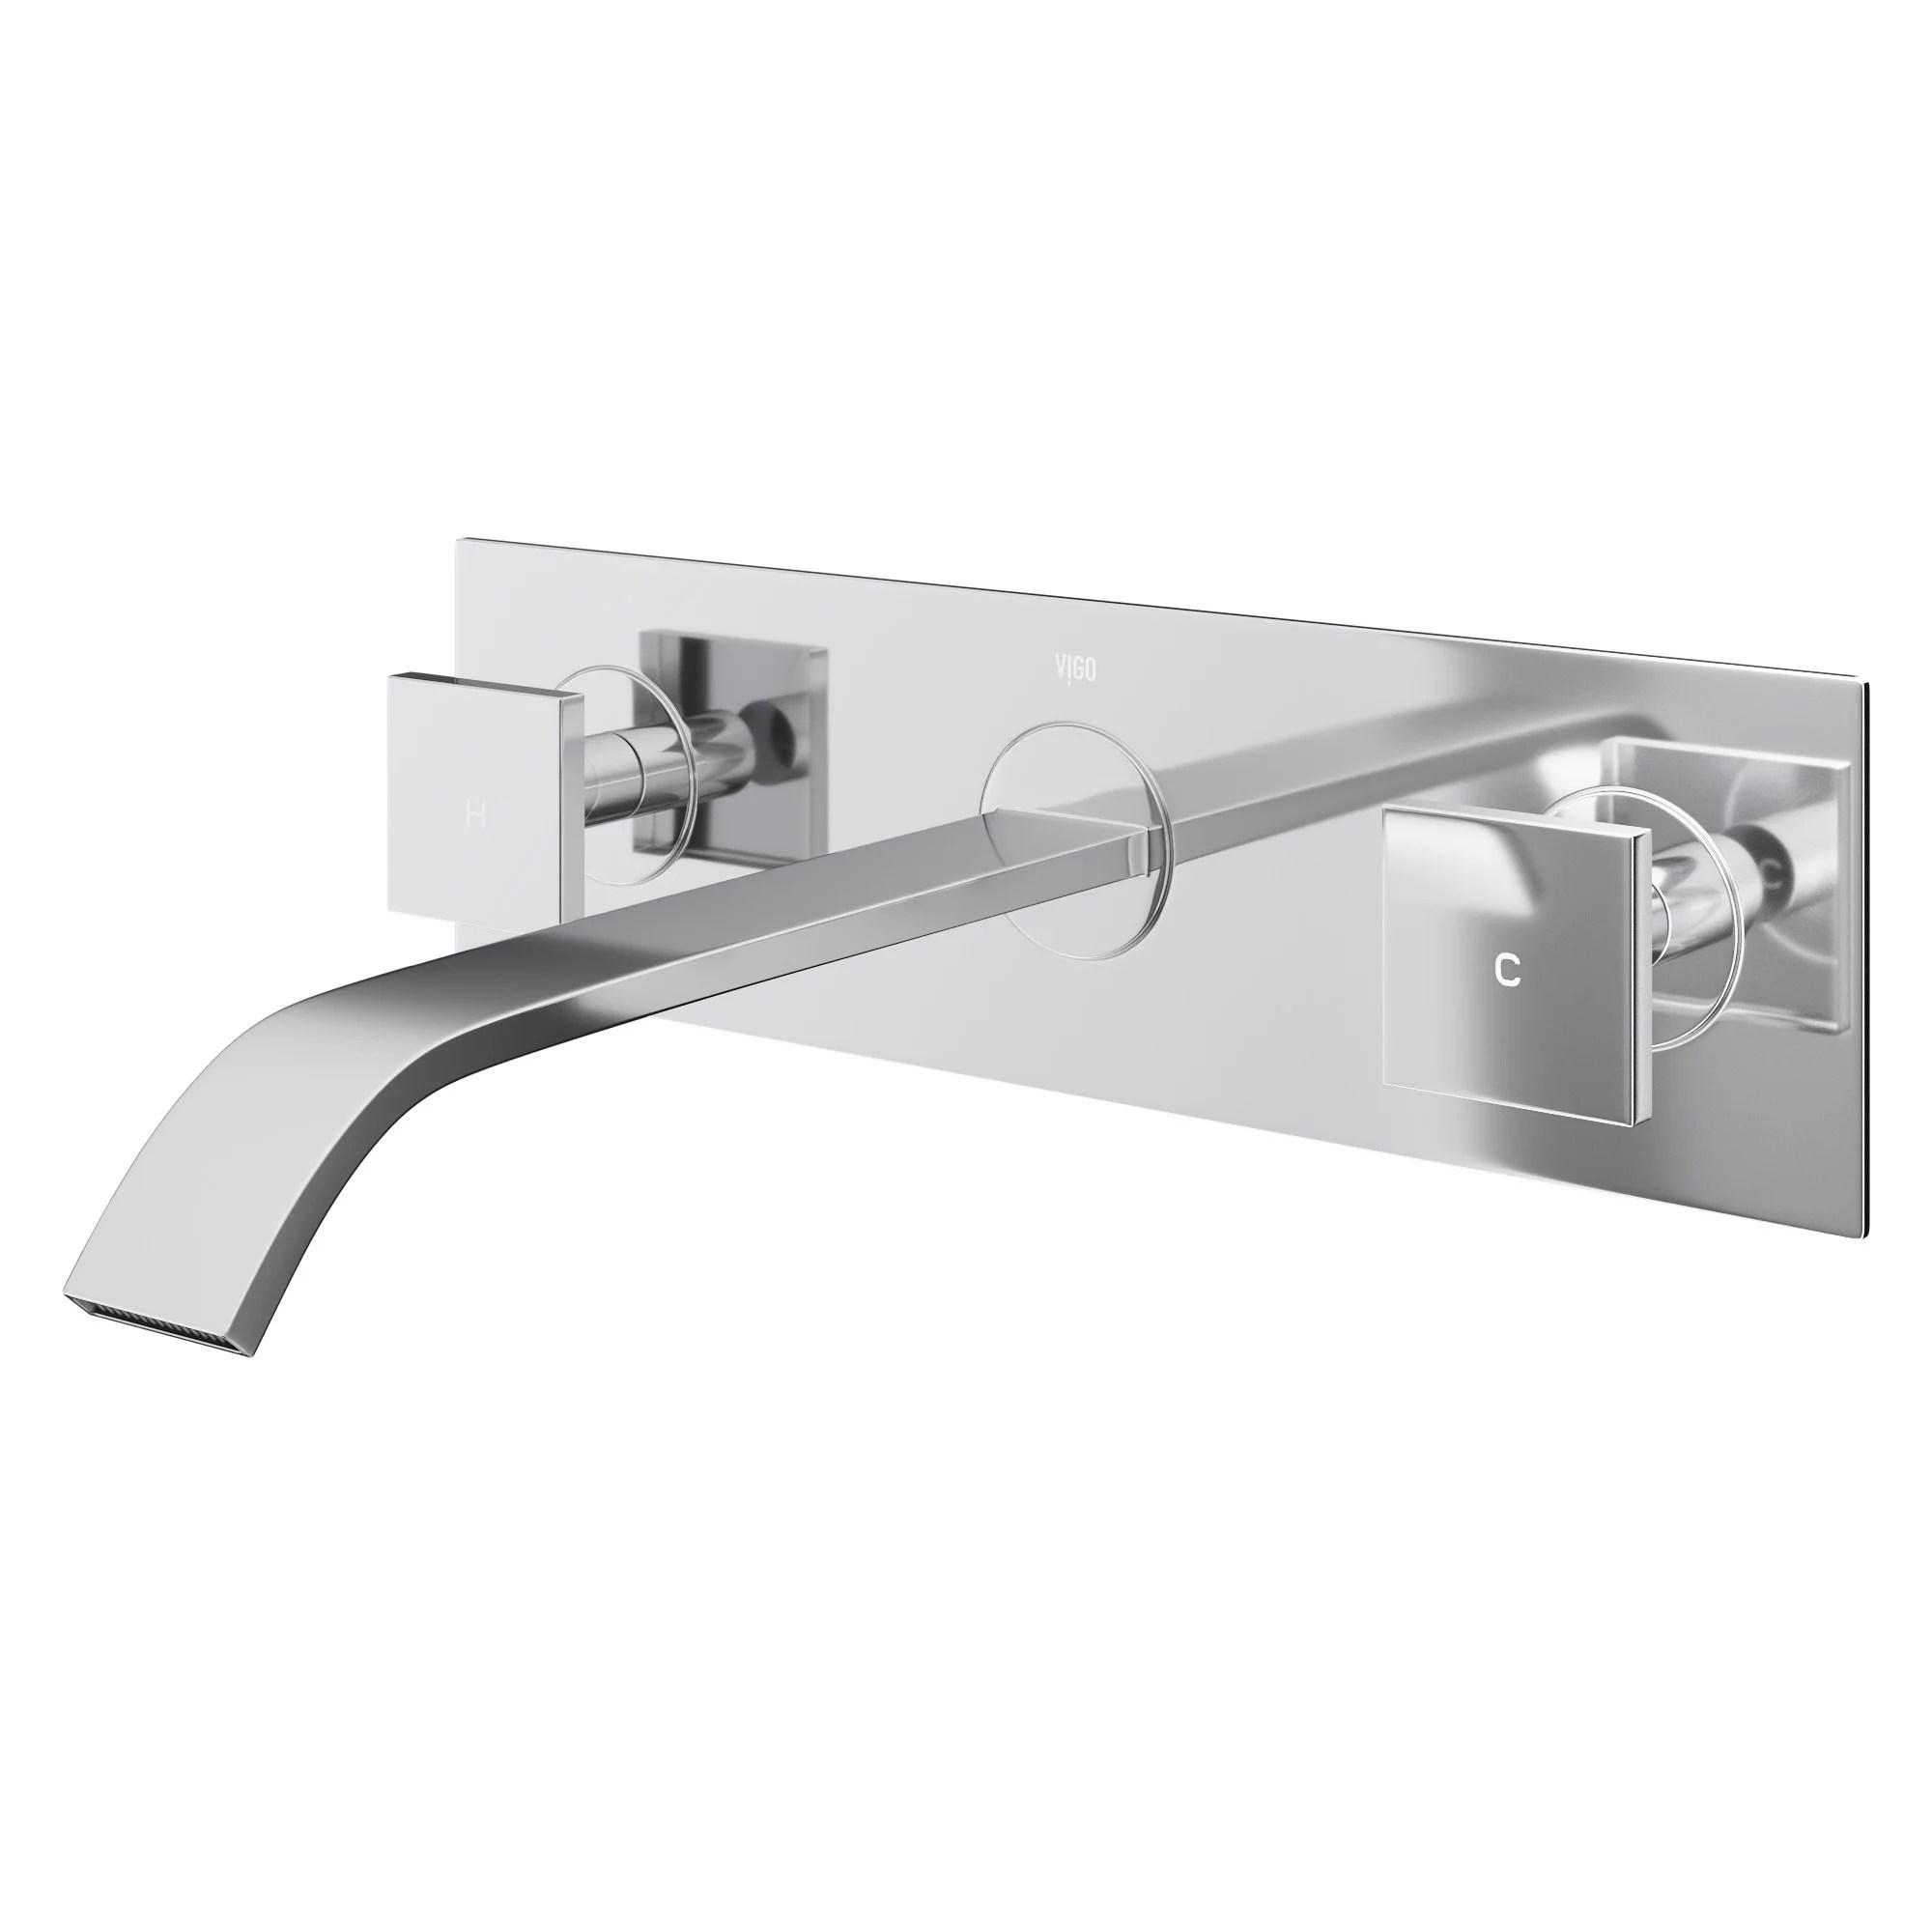 vg05002 wall mount bathroom sink faucet